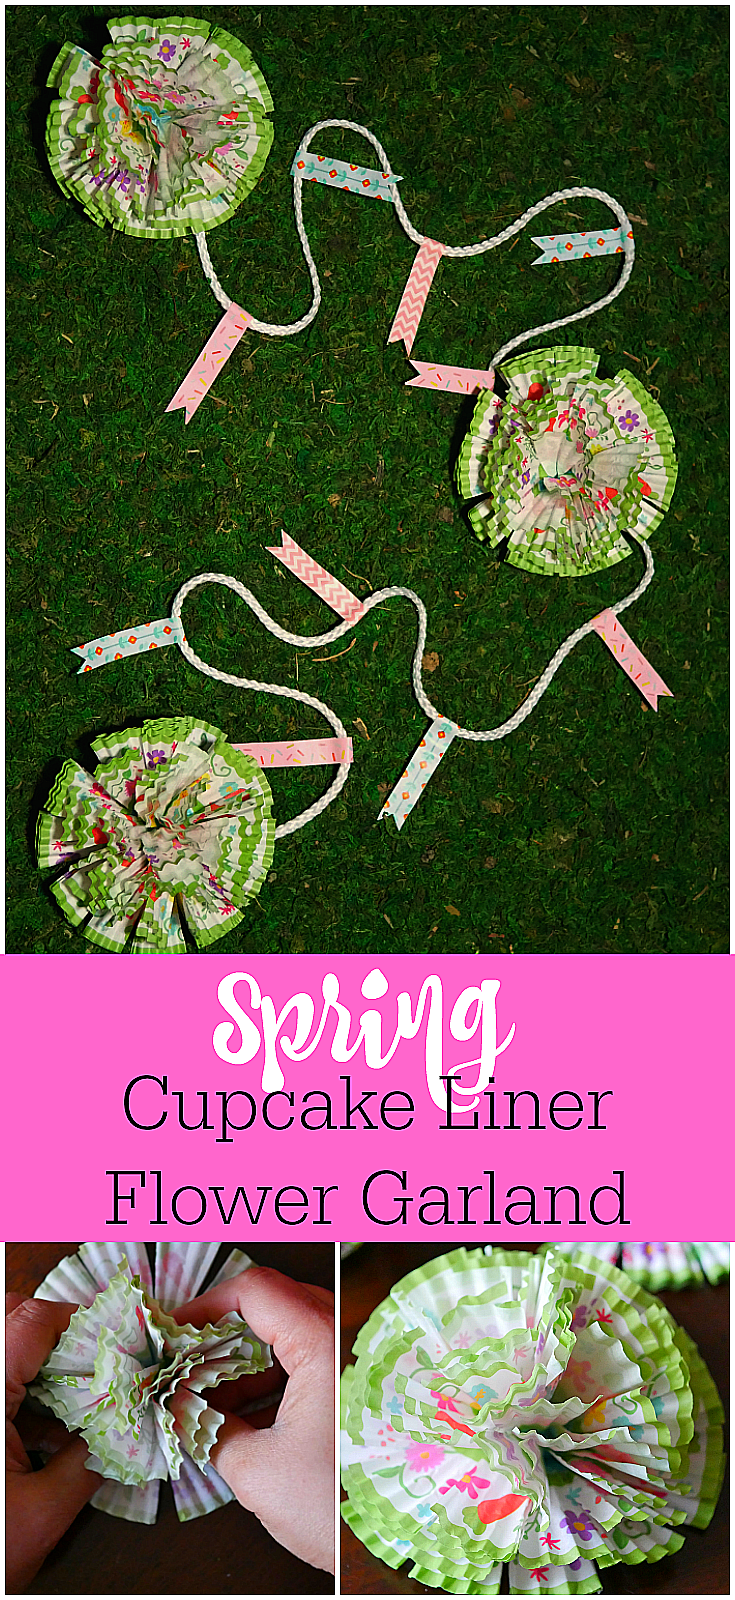 Spring Cupcake Liner Flower Garland  Simple Spring Decoration